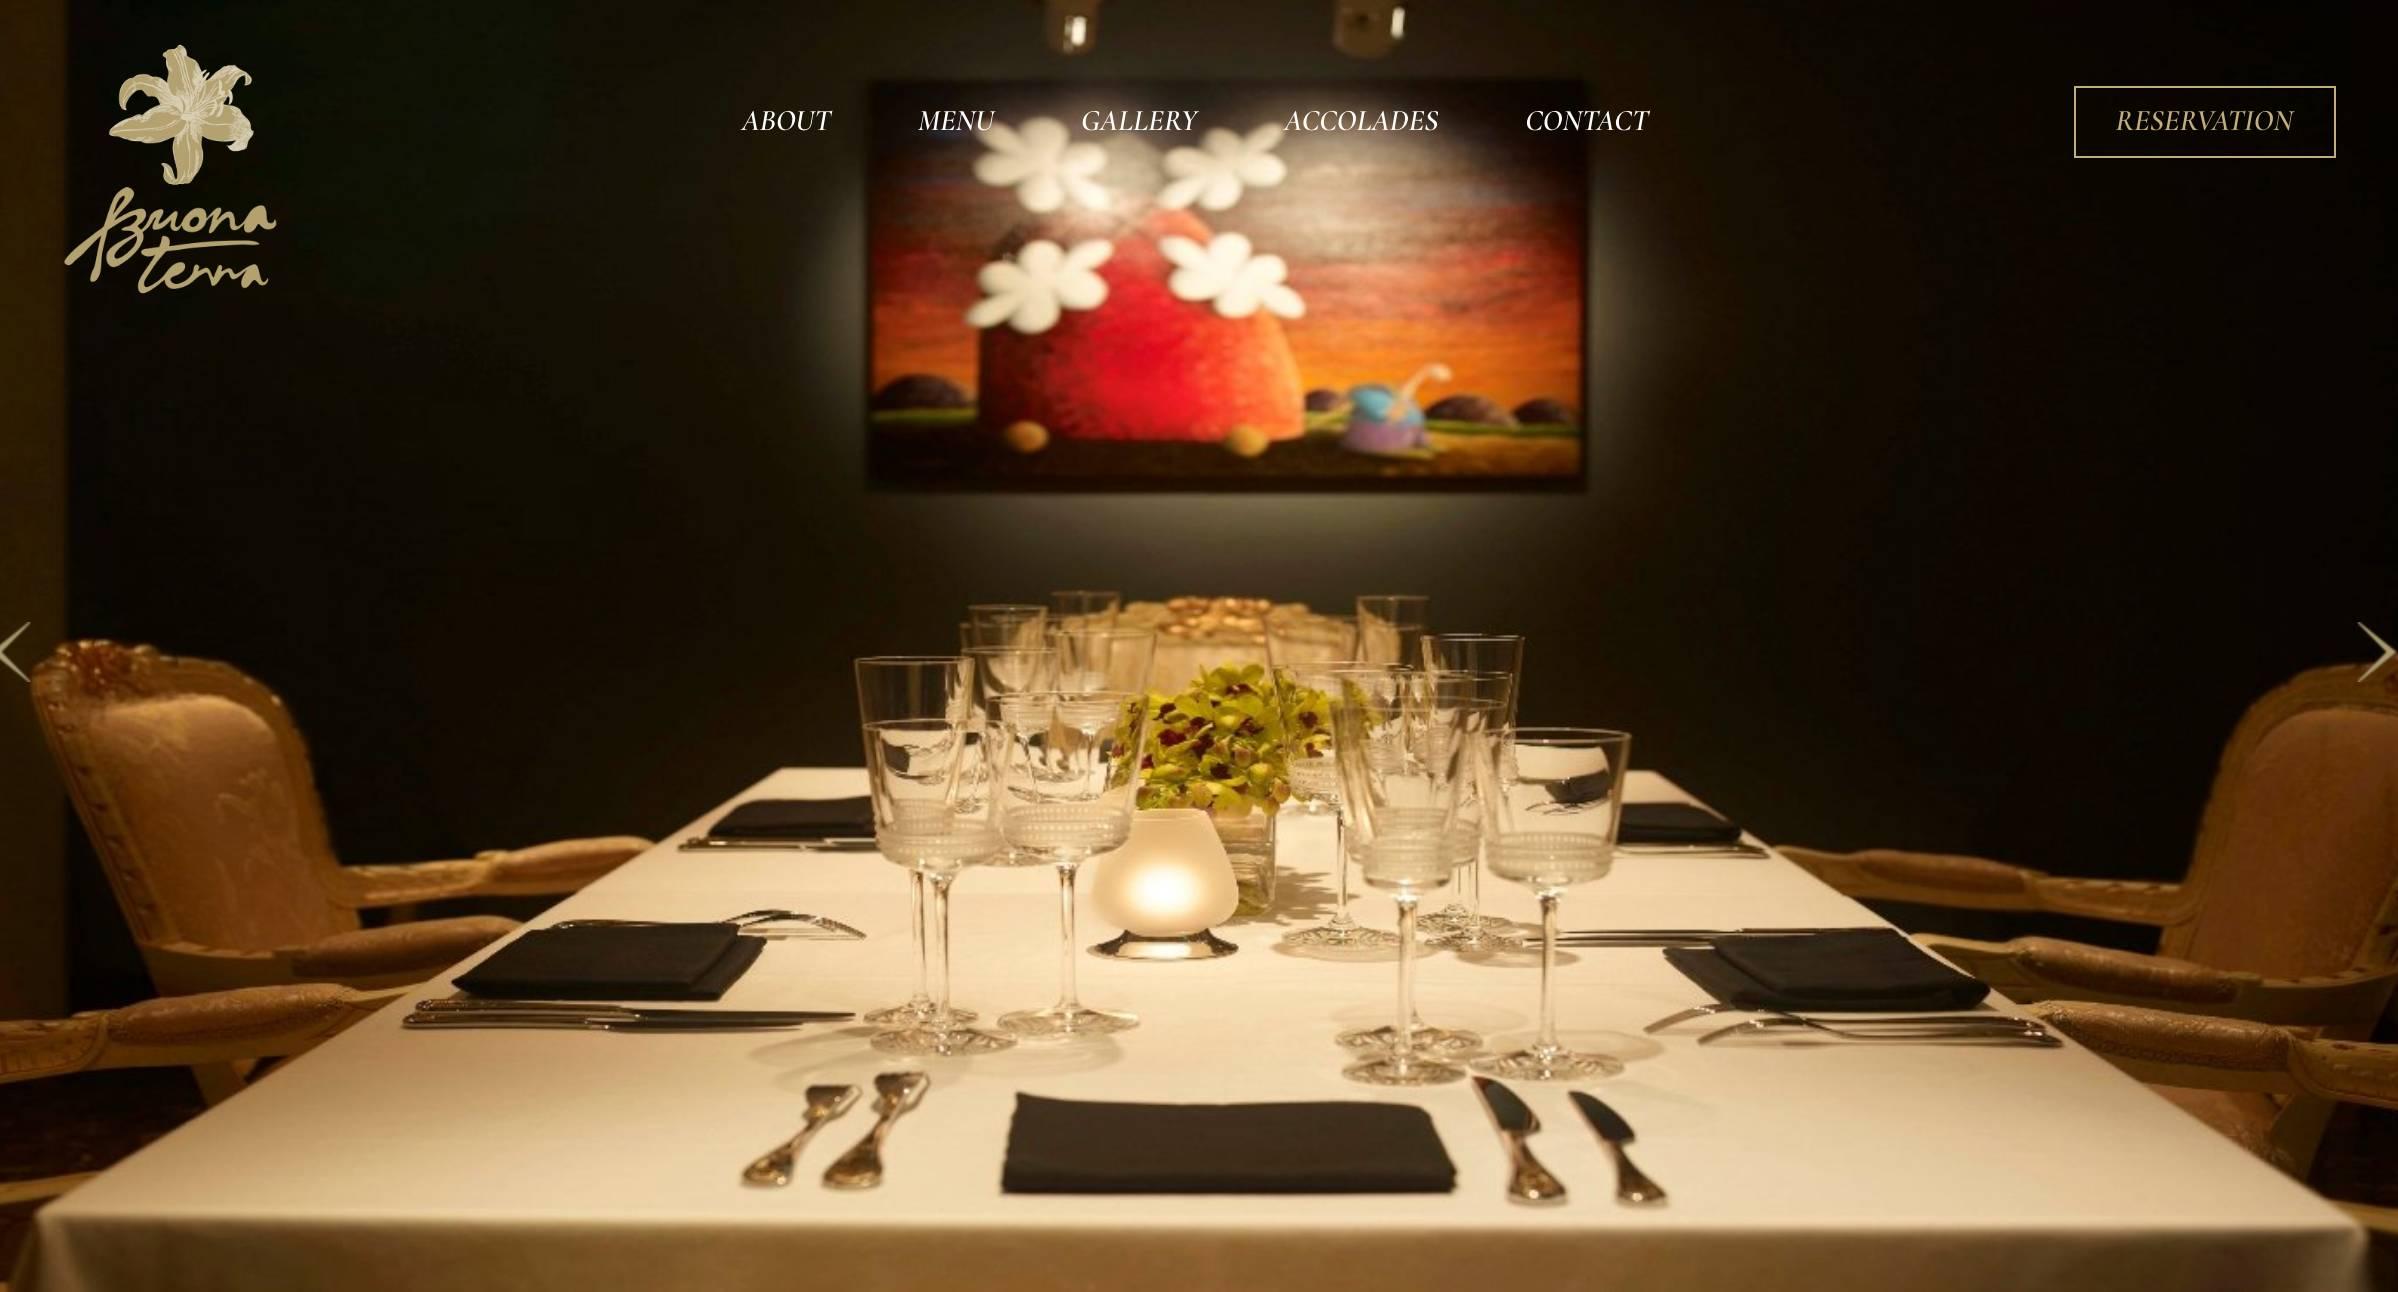 Top Italian Restaurant In Singapore - Buona Terra